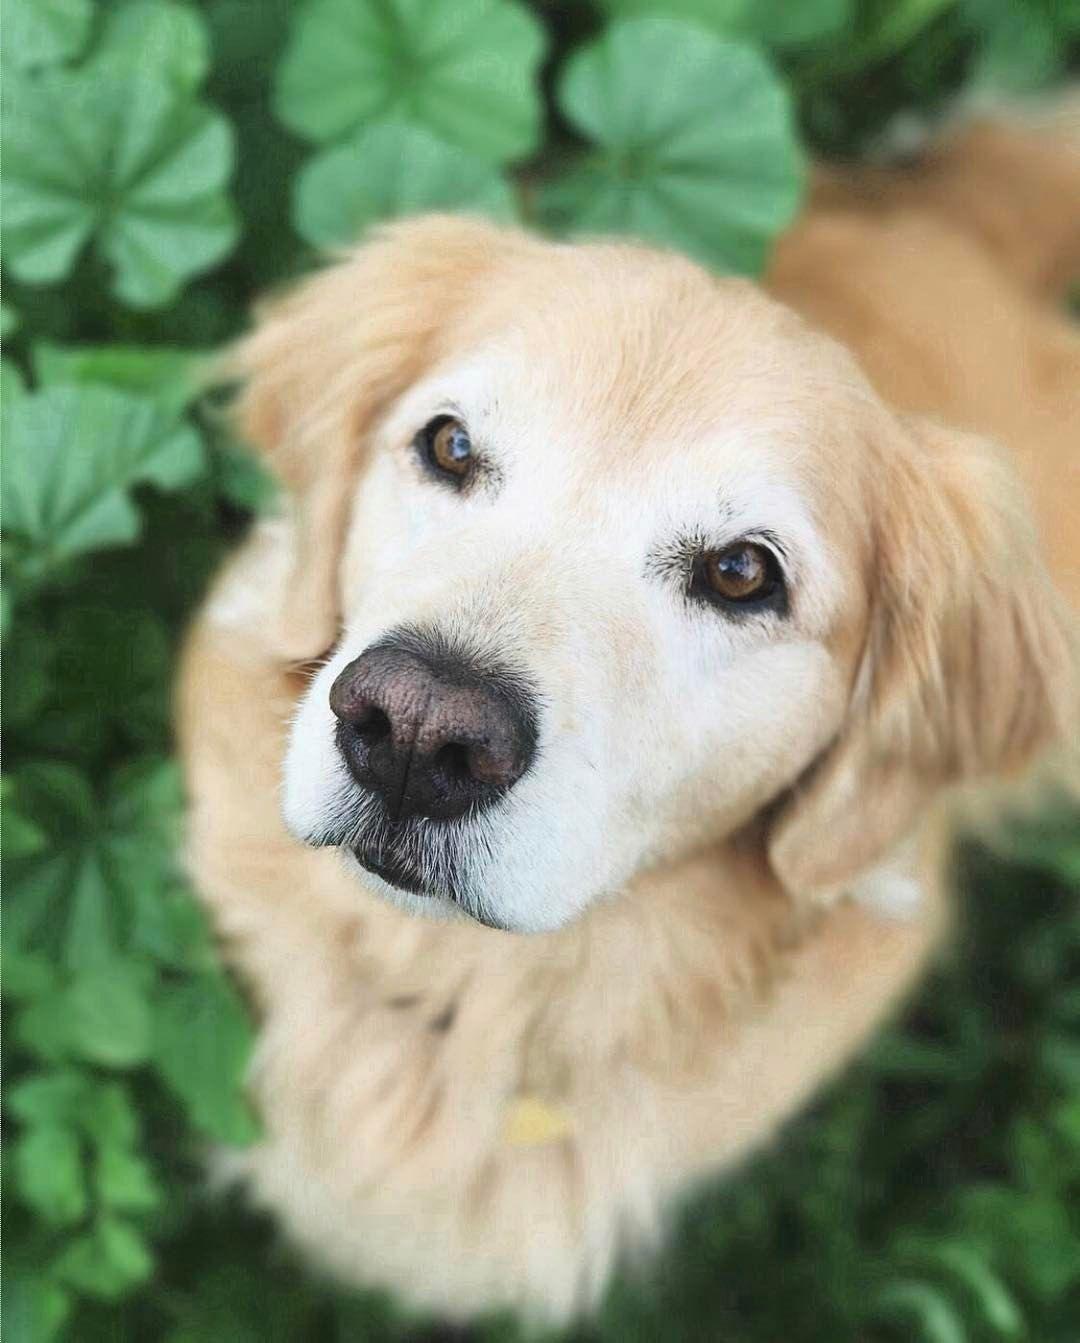 That Sweet White Face Of A Golden Golden Retriever Dog